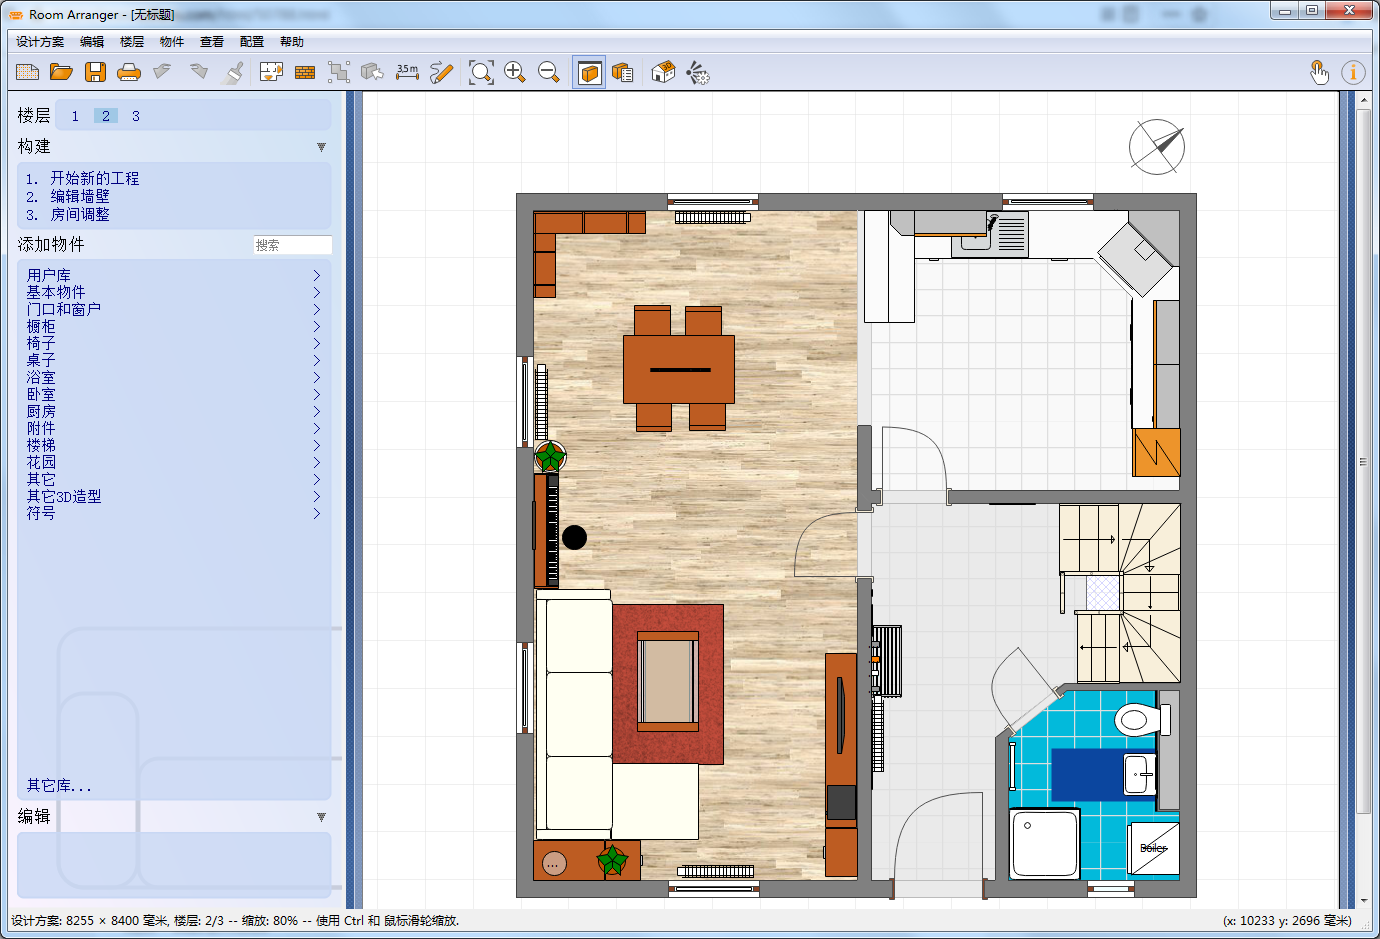 Adasoft Room Arranger(房屋布局设计)截图